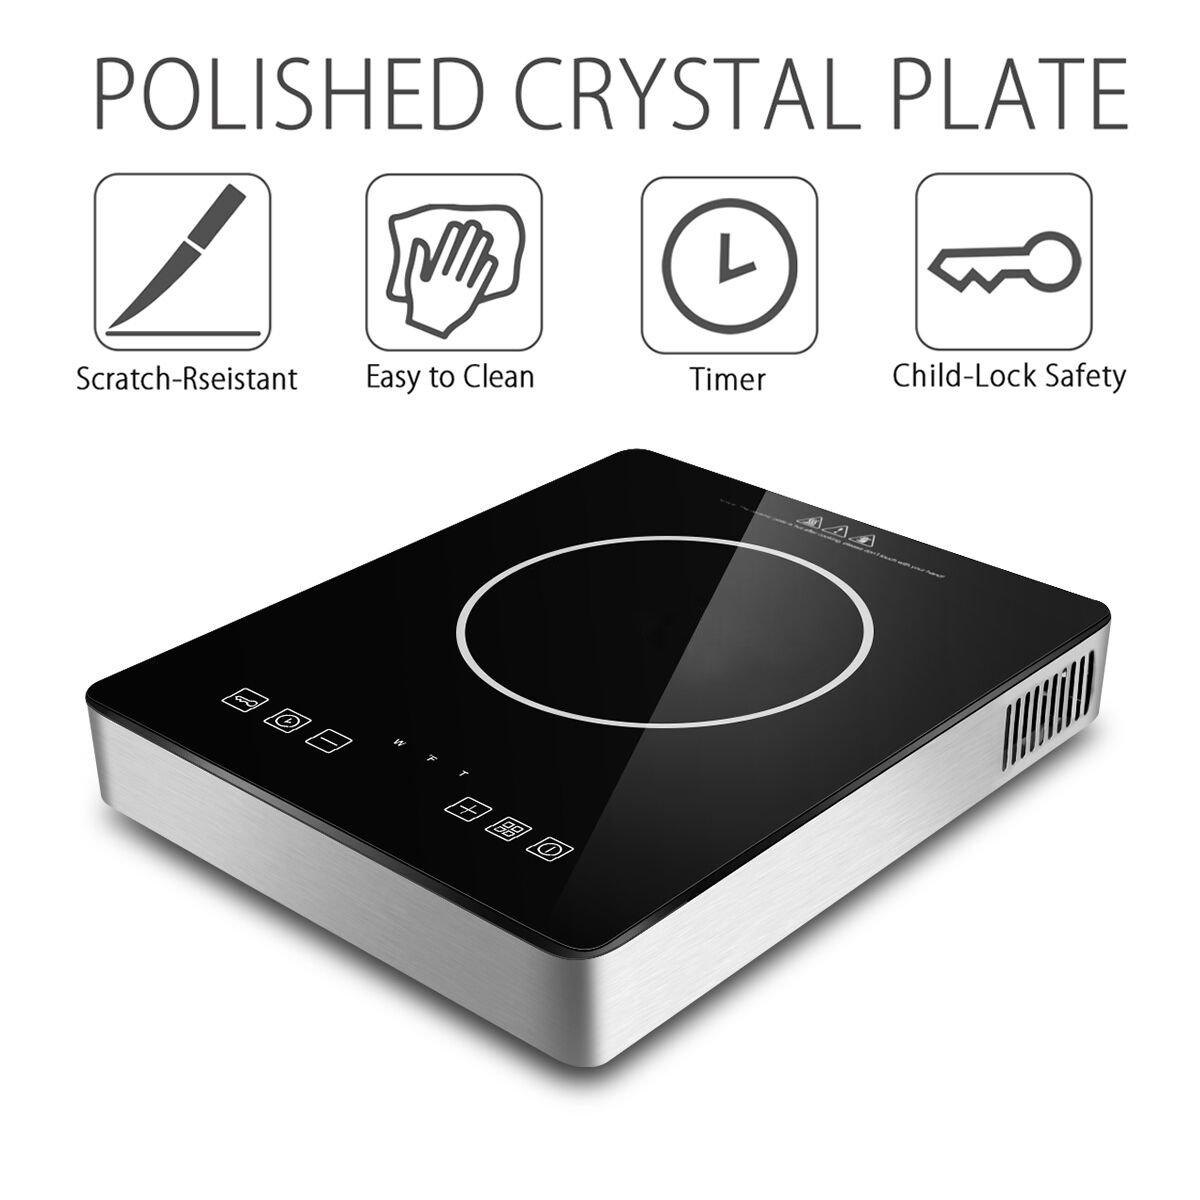 induction duxtop watch countertop countertops cooktop burner secura youtube portable watt unboxing